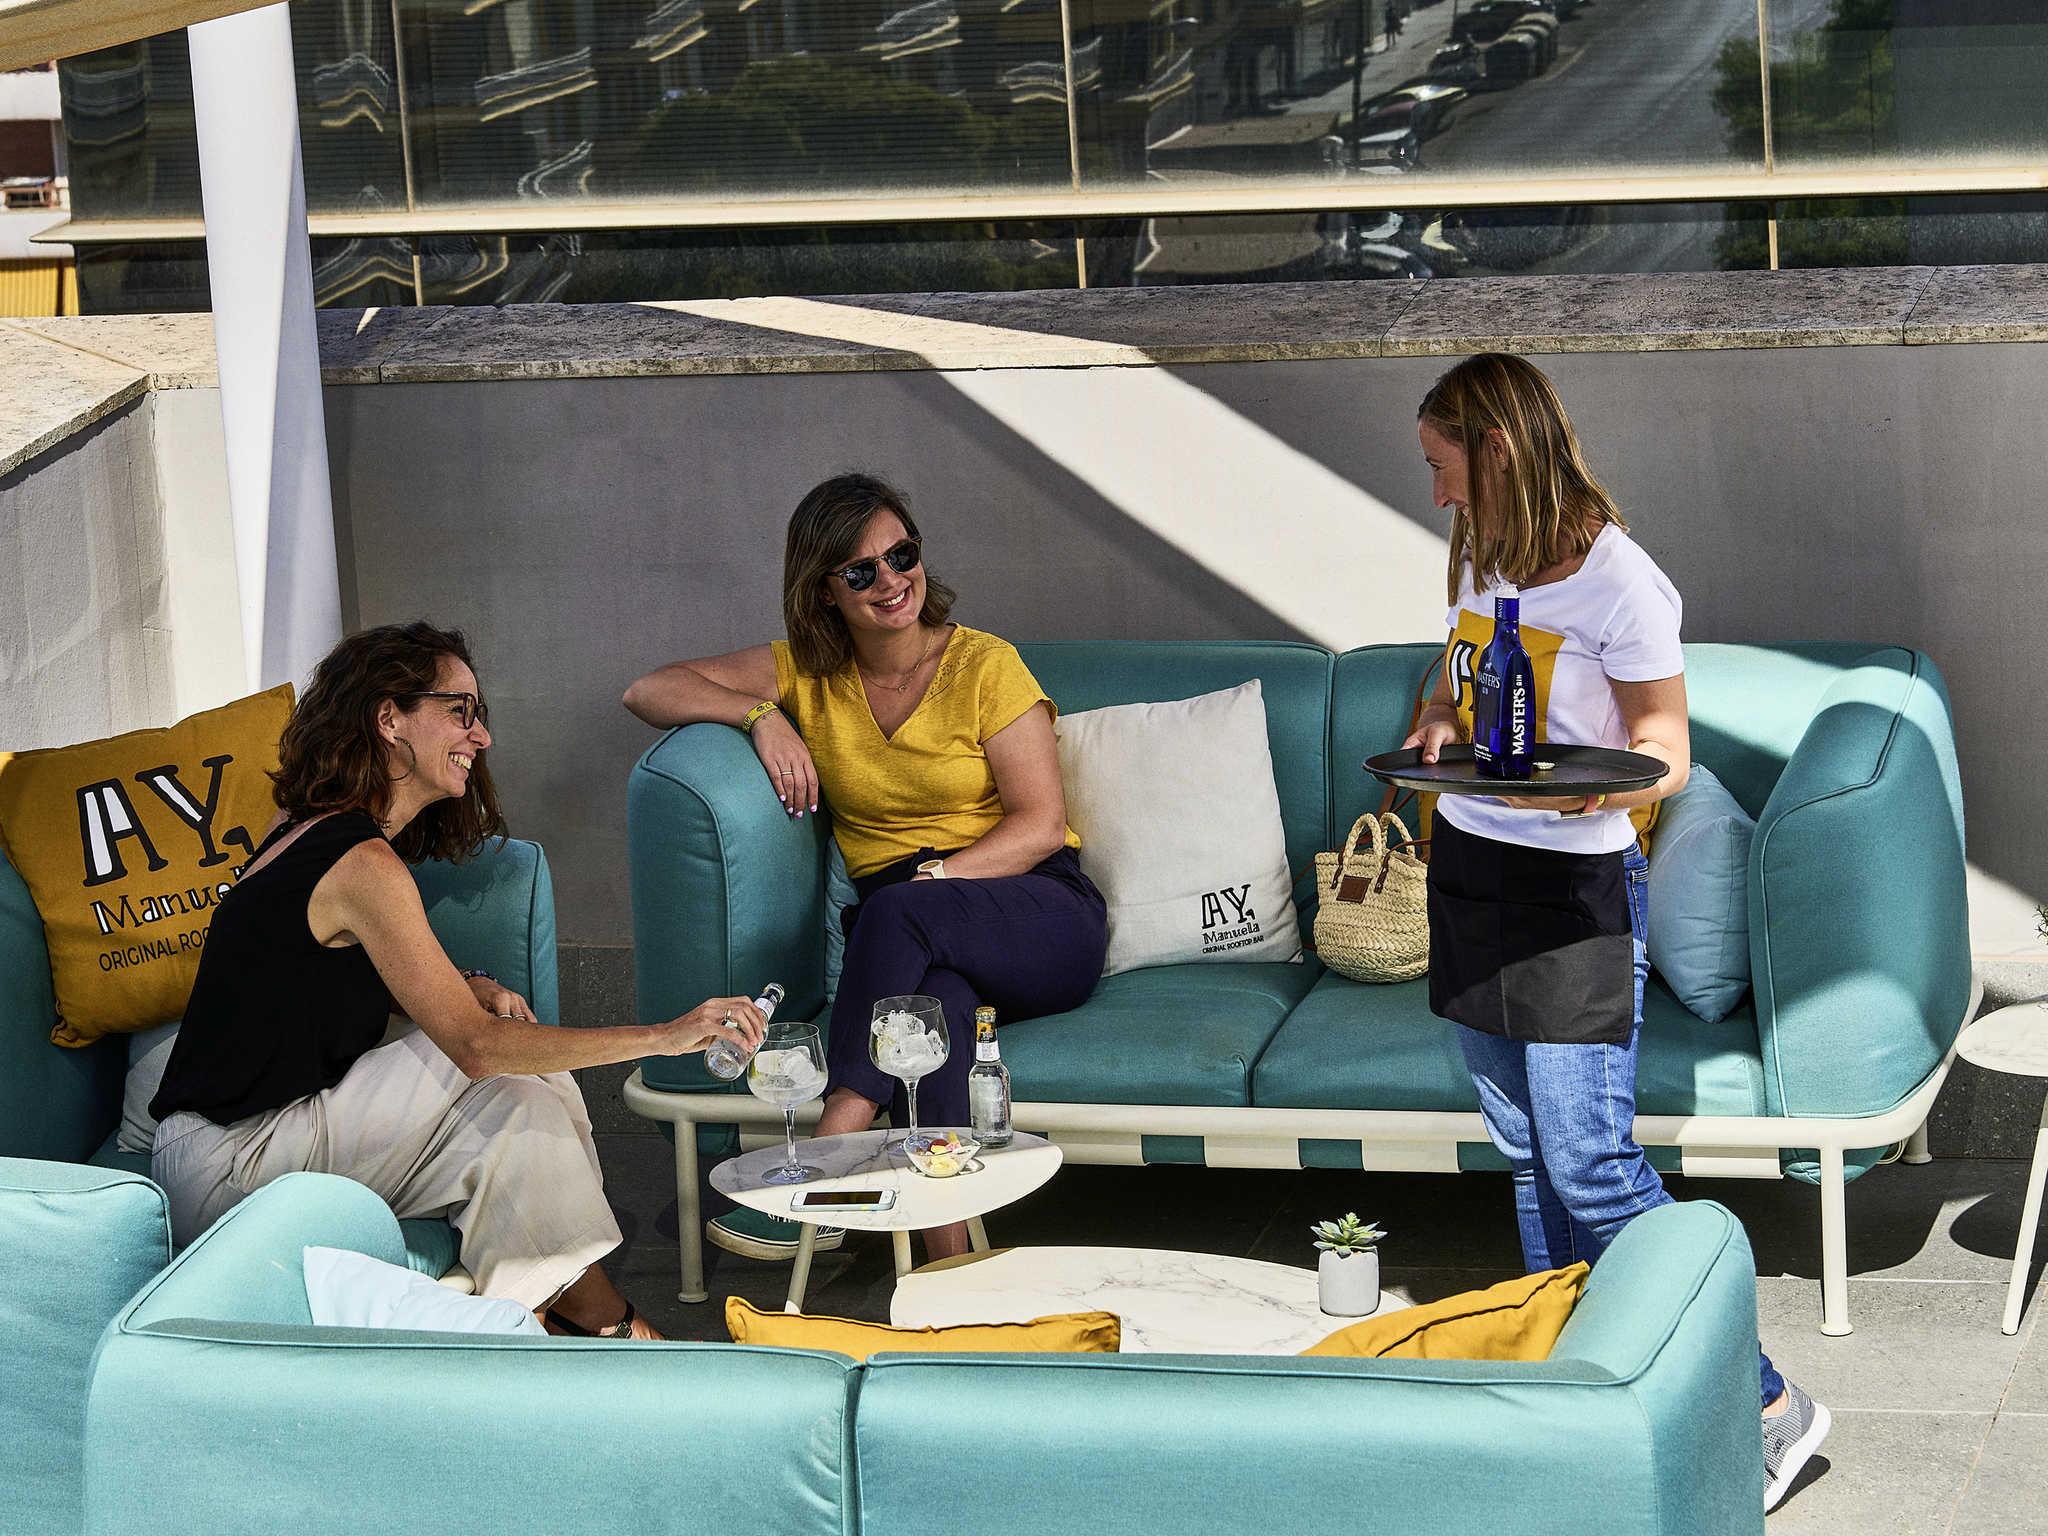 Novotel sevilla hoteles en sevilla accorhotrvion con for Hoteles sevilla con piscina